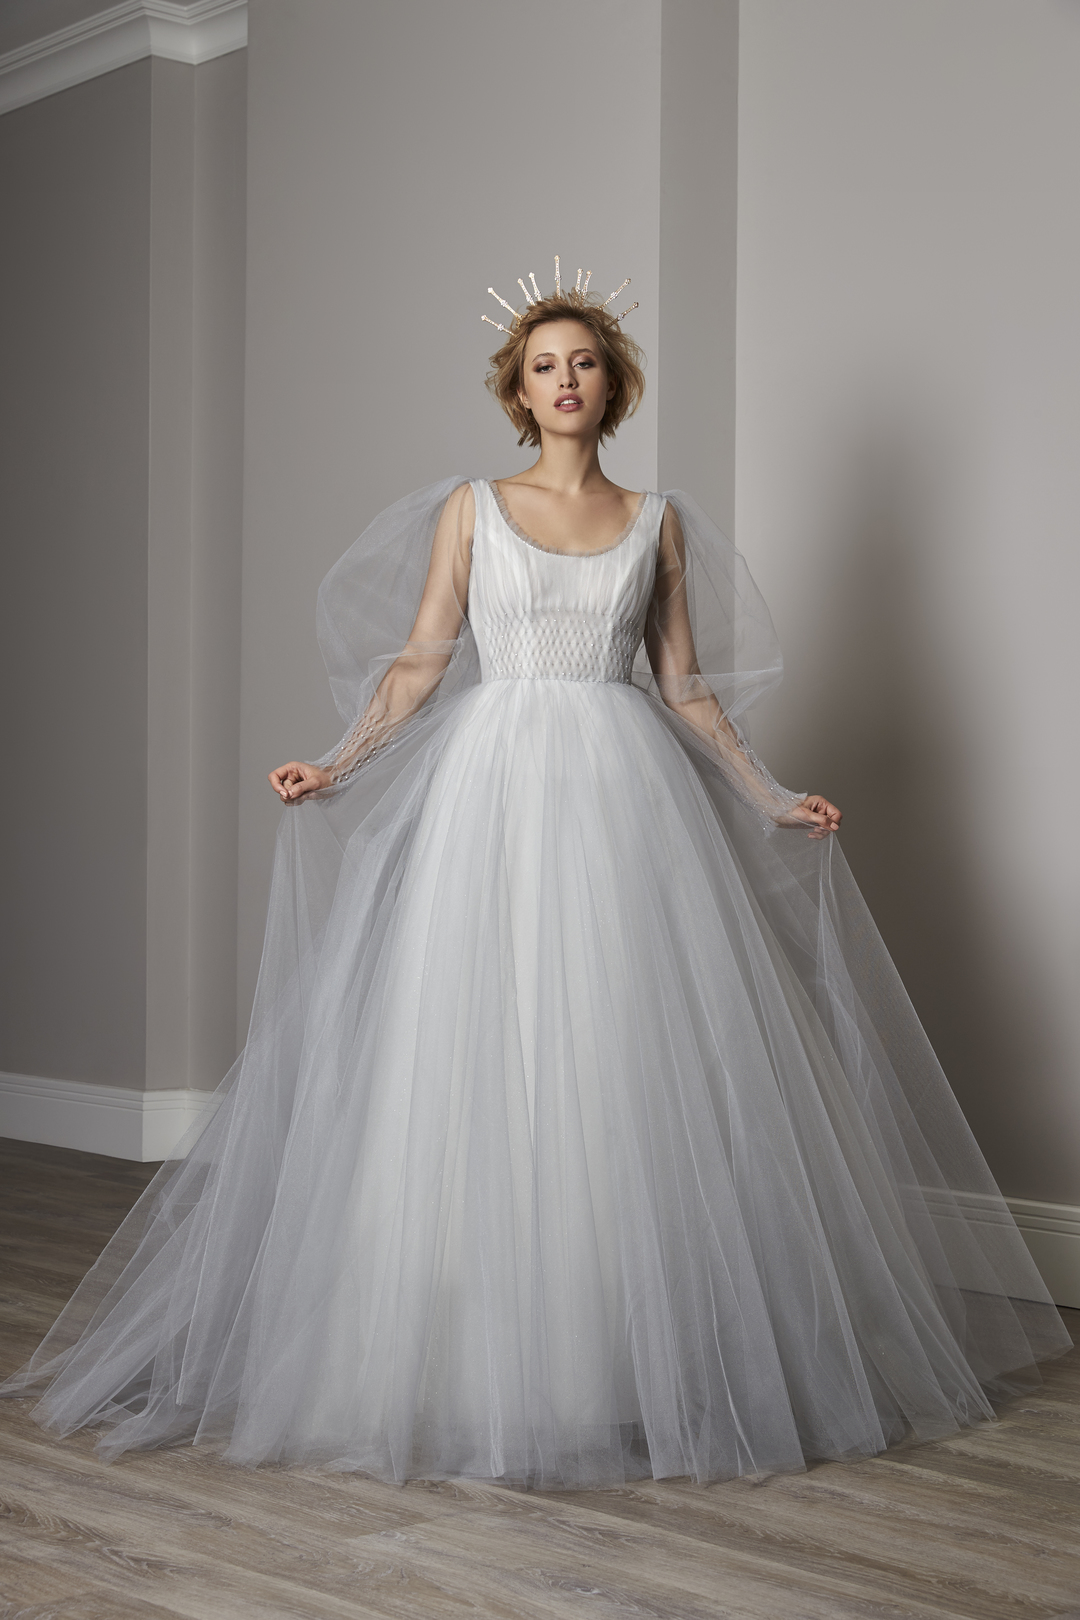 thea dress photo